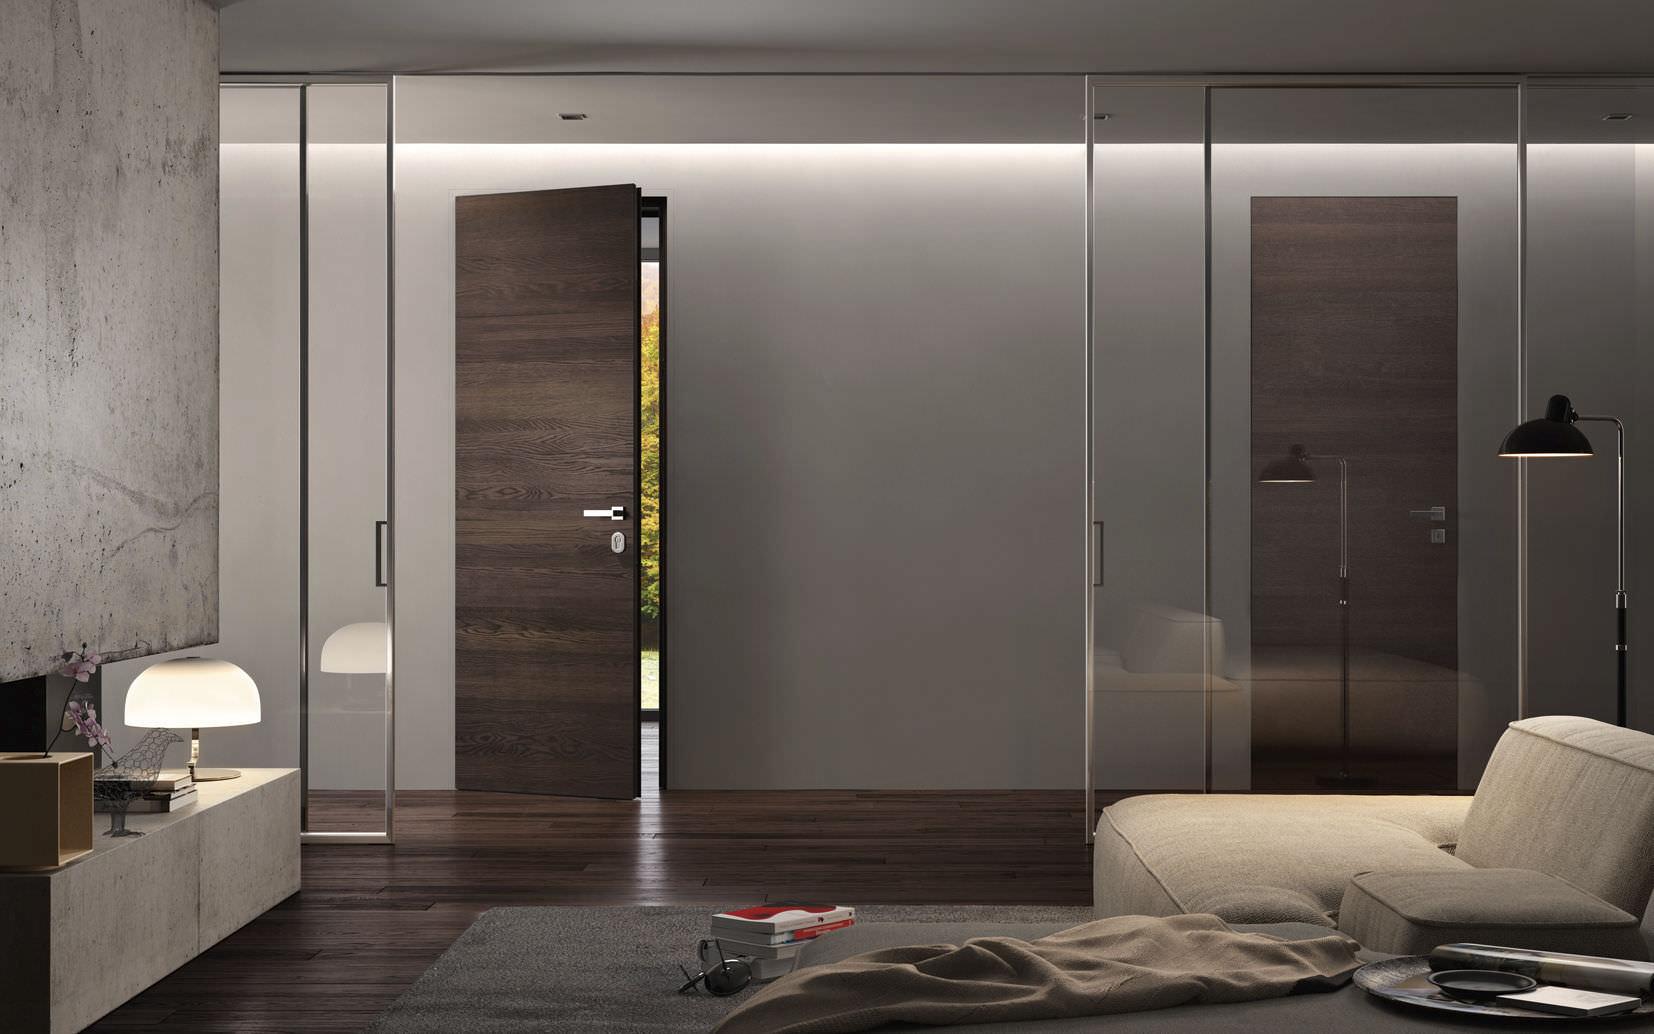 Armadio Raso Muro closet door - sovrana filomuro + bisystem - garofoli - for